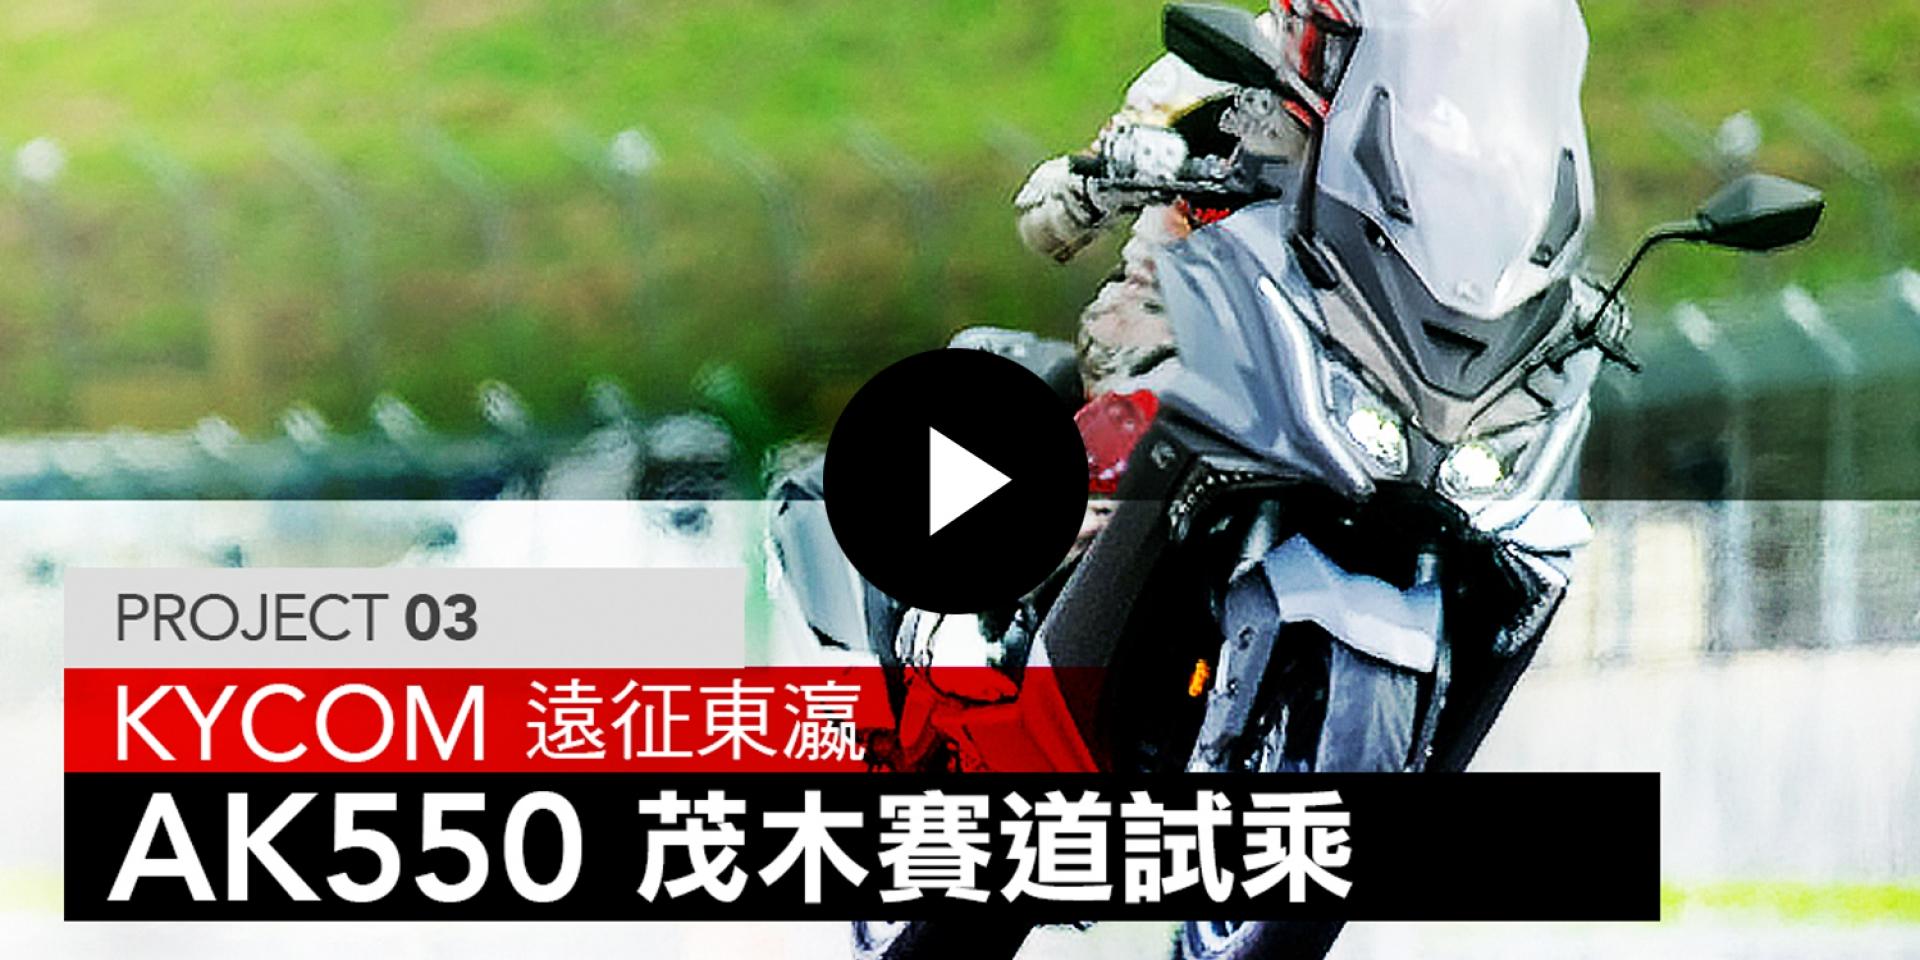 KYMCO遠征東瀛 AK550茂木賽道試乘 / PROJECT 03